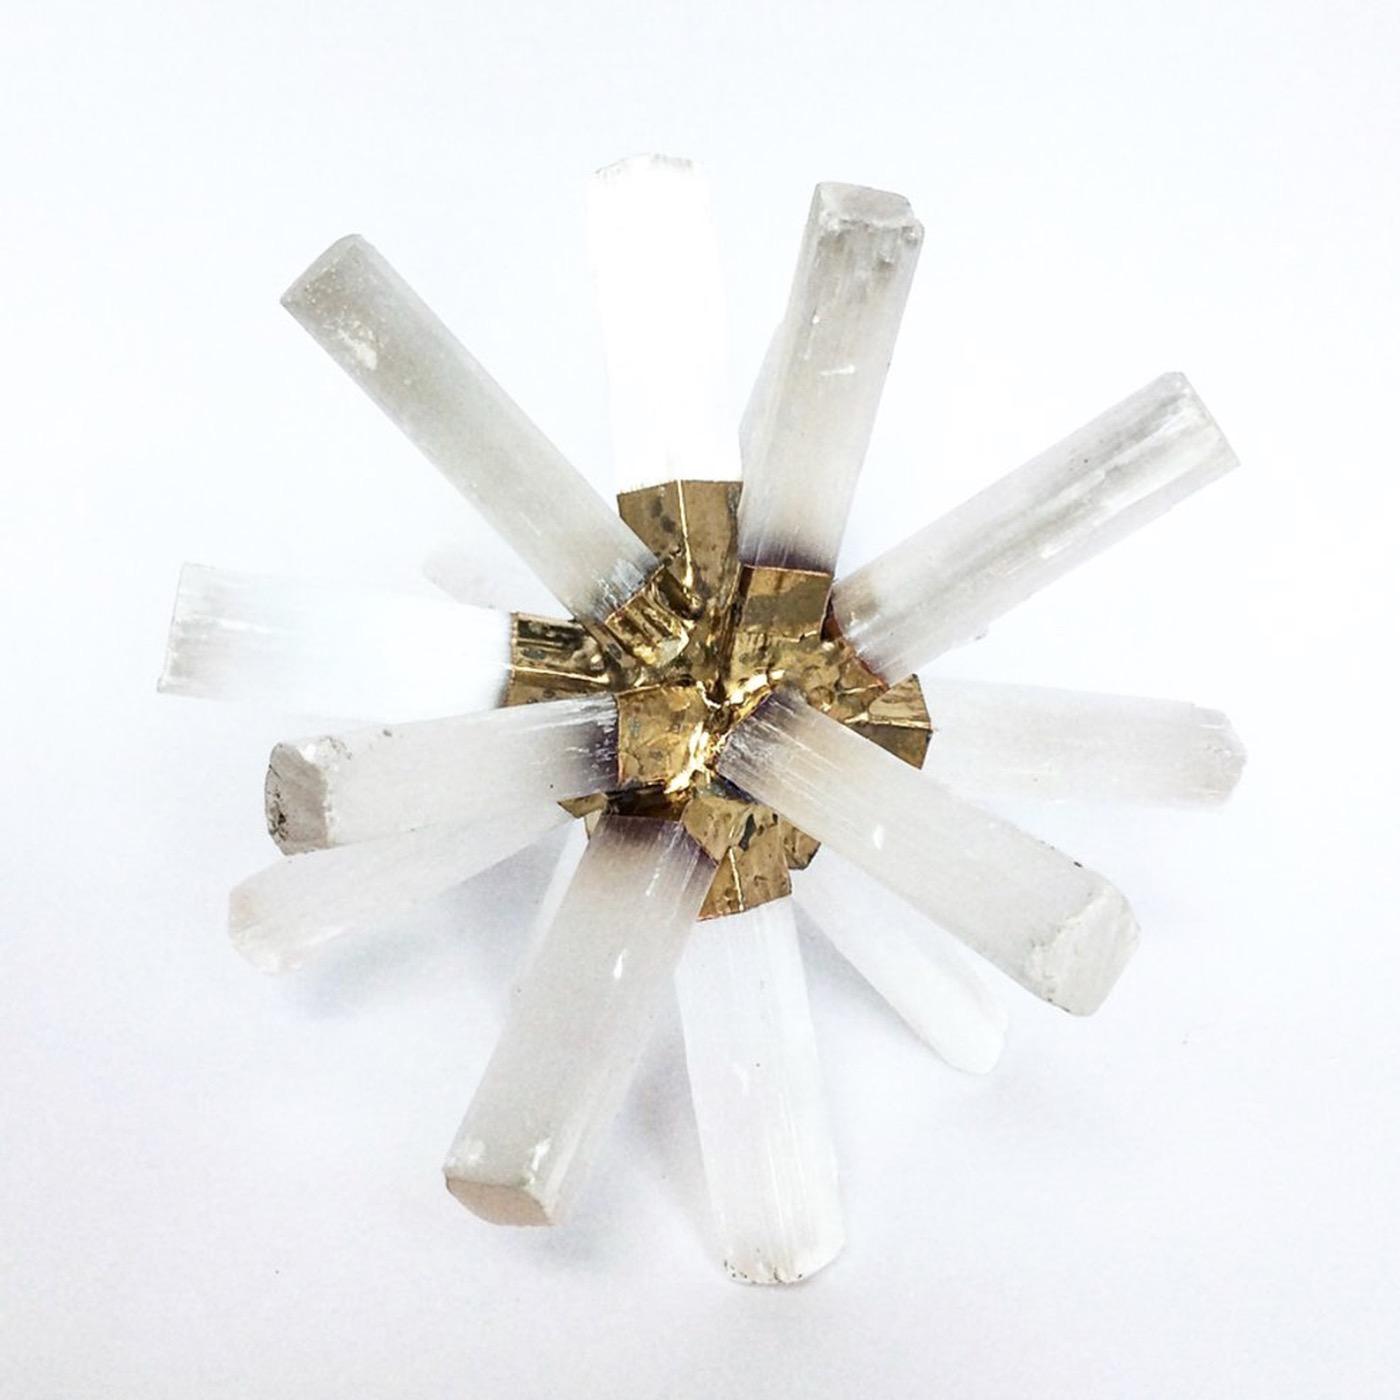 Mazzy Selenite Starburst Sculptures